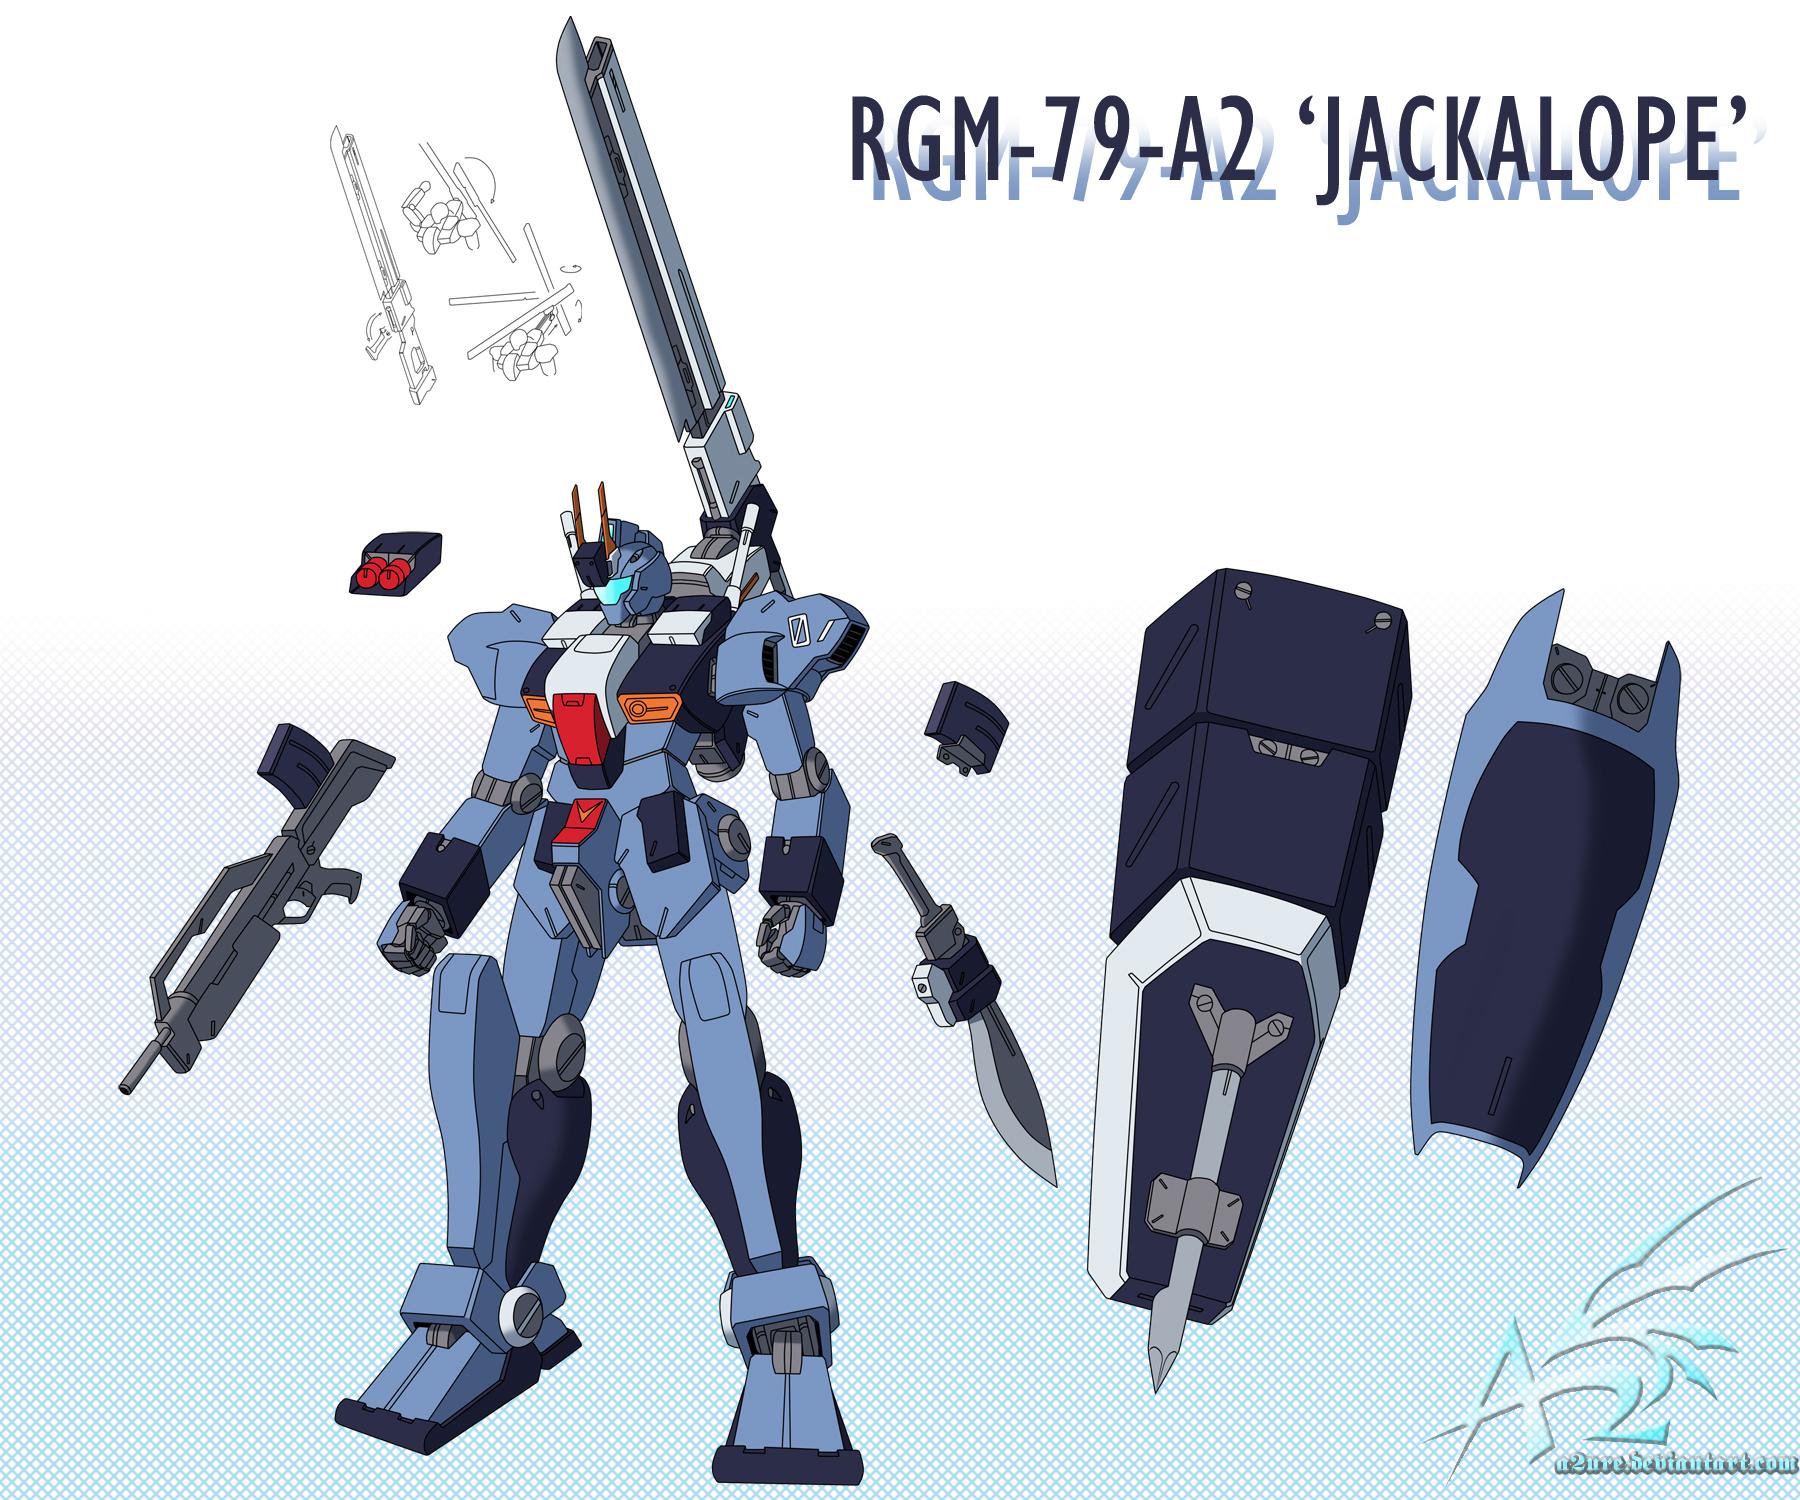 RGM-79-A2 Jackalope by a2ure